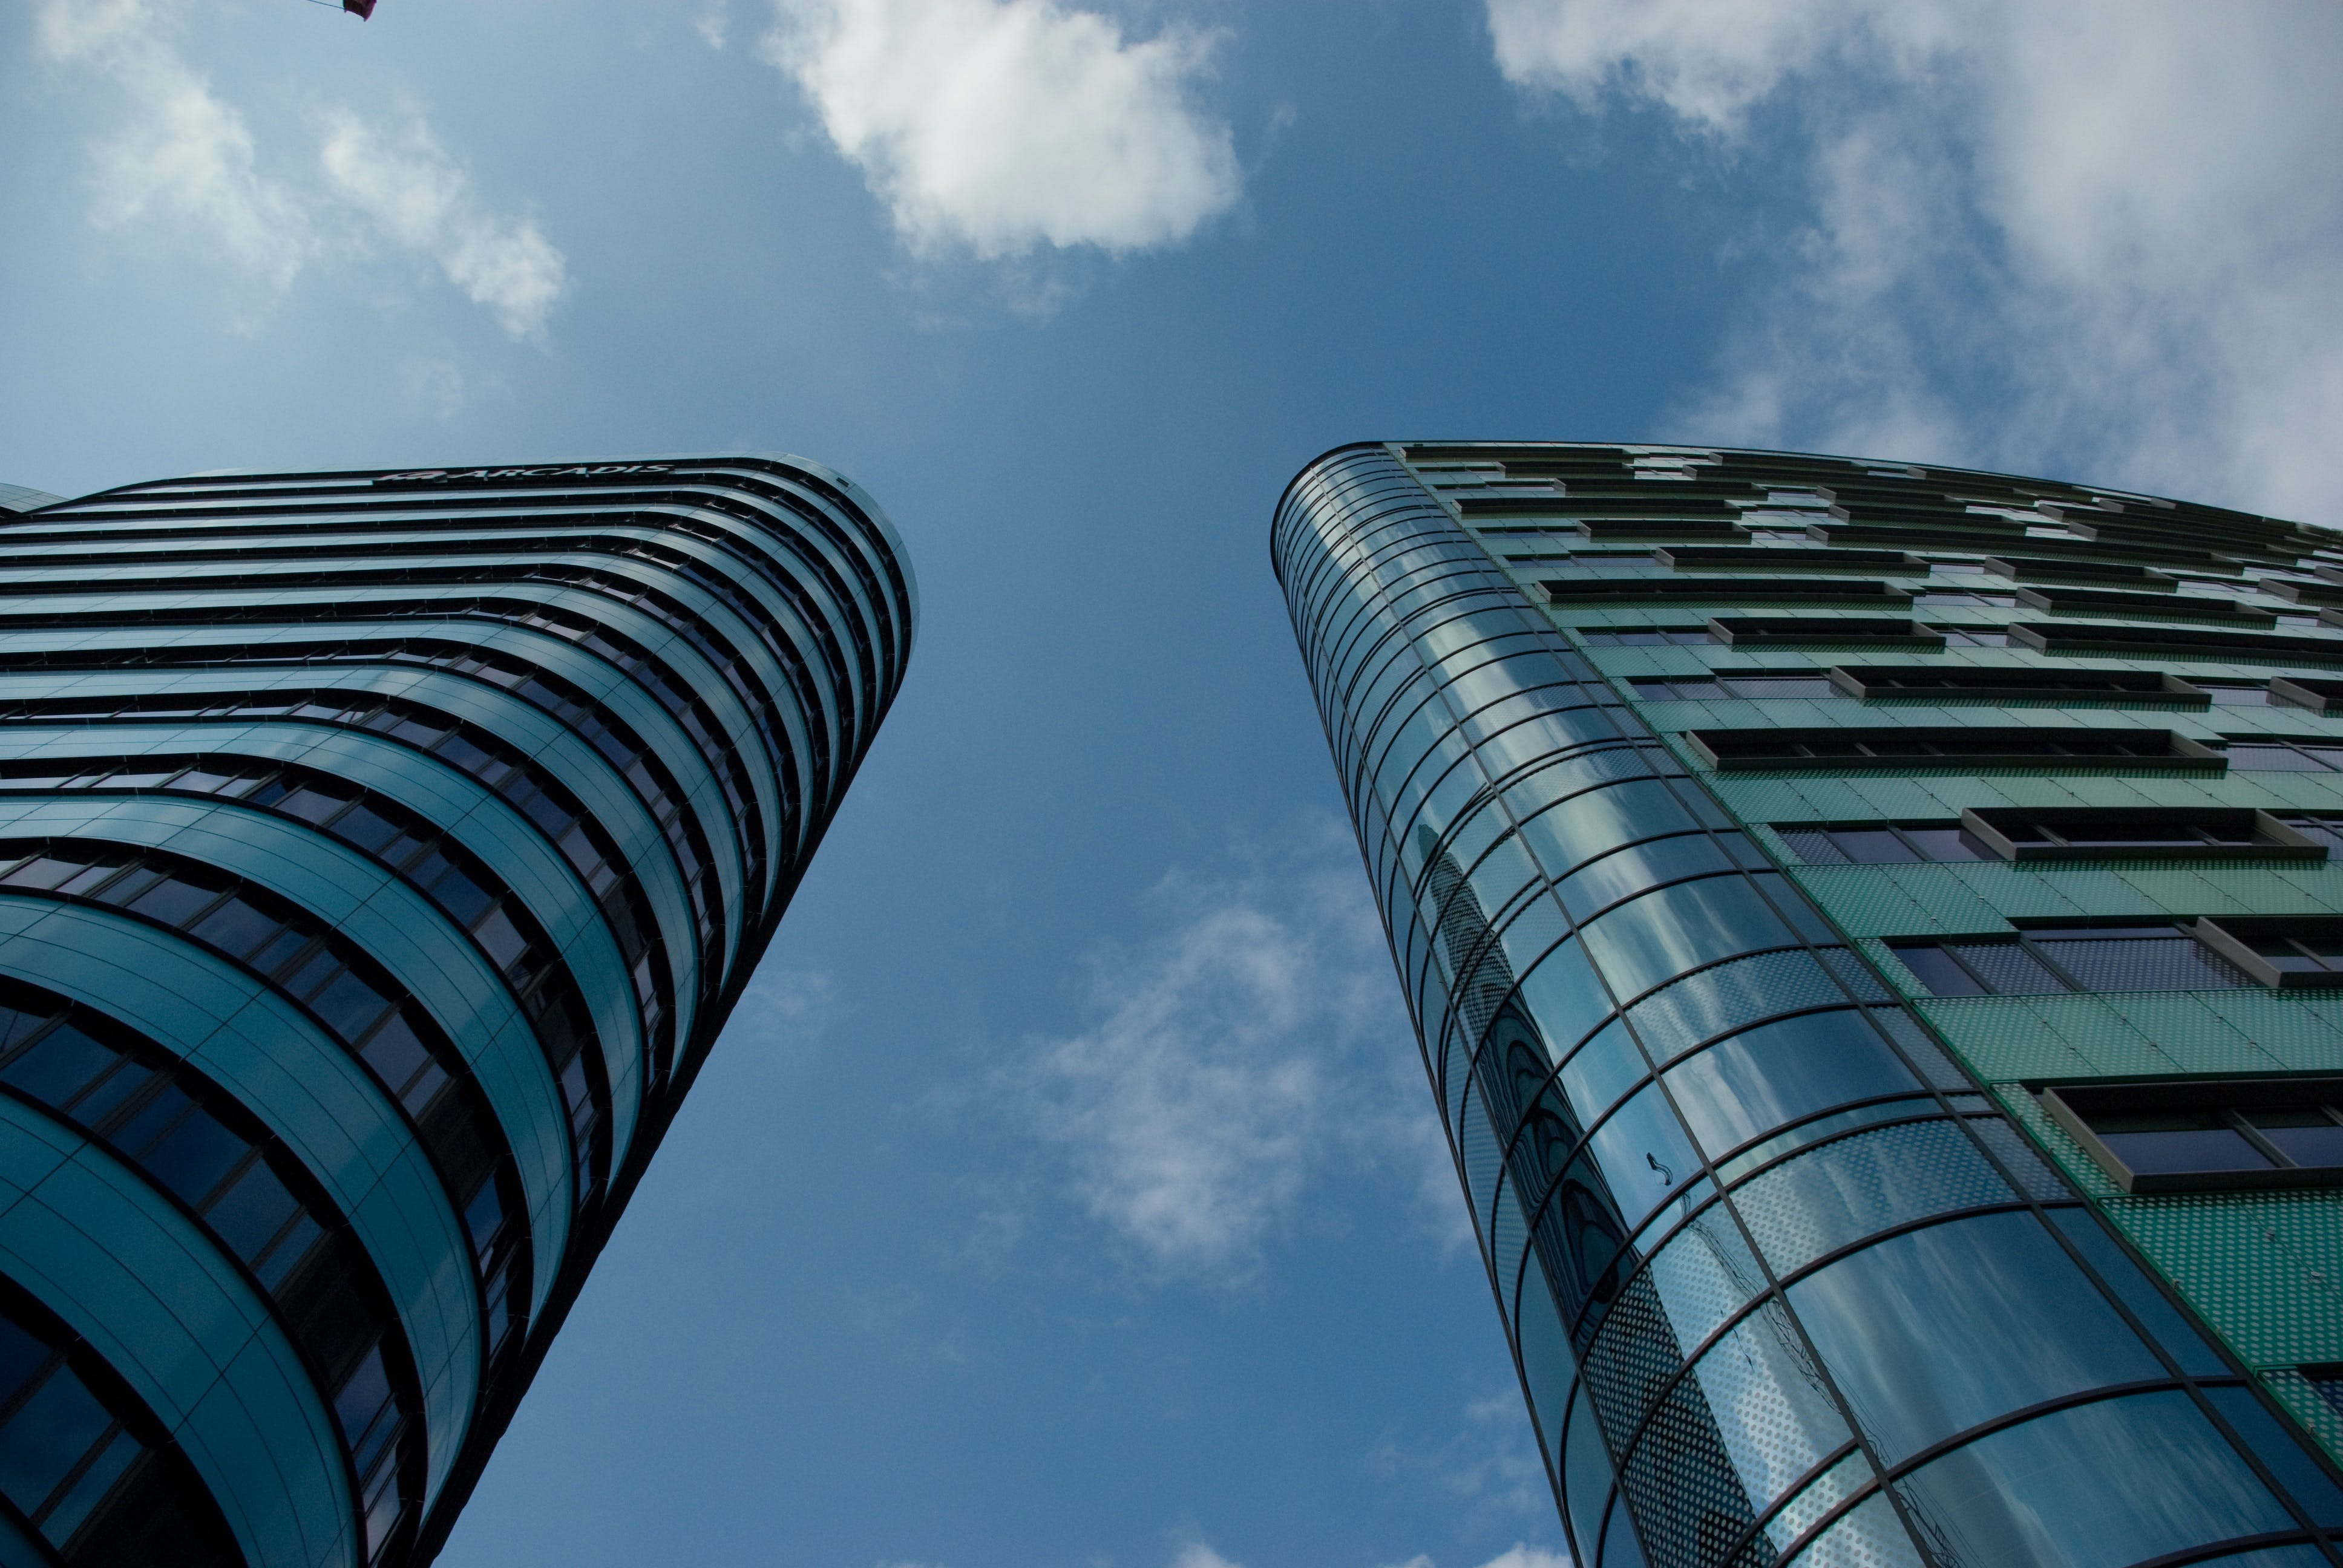 architecture, blue sky, buildings